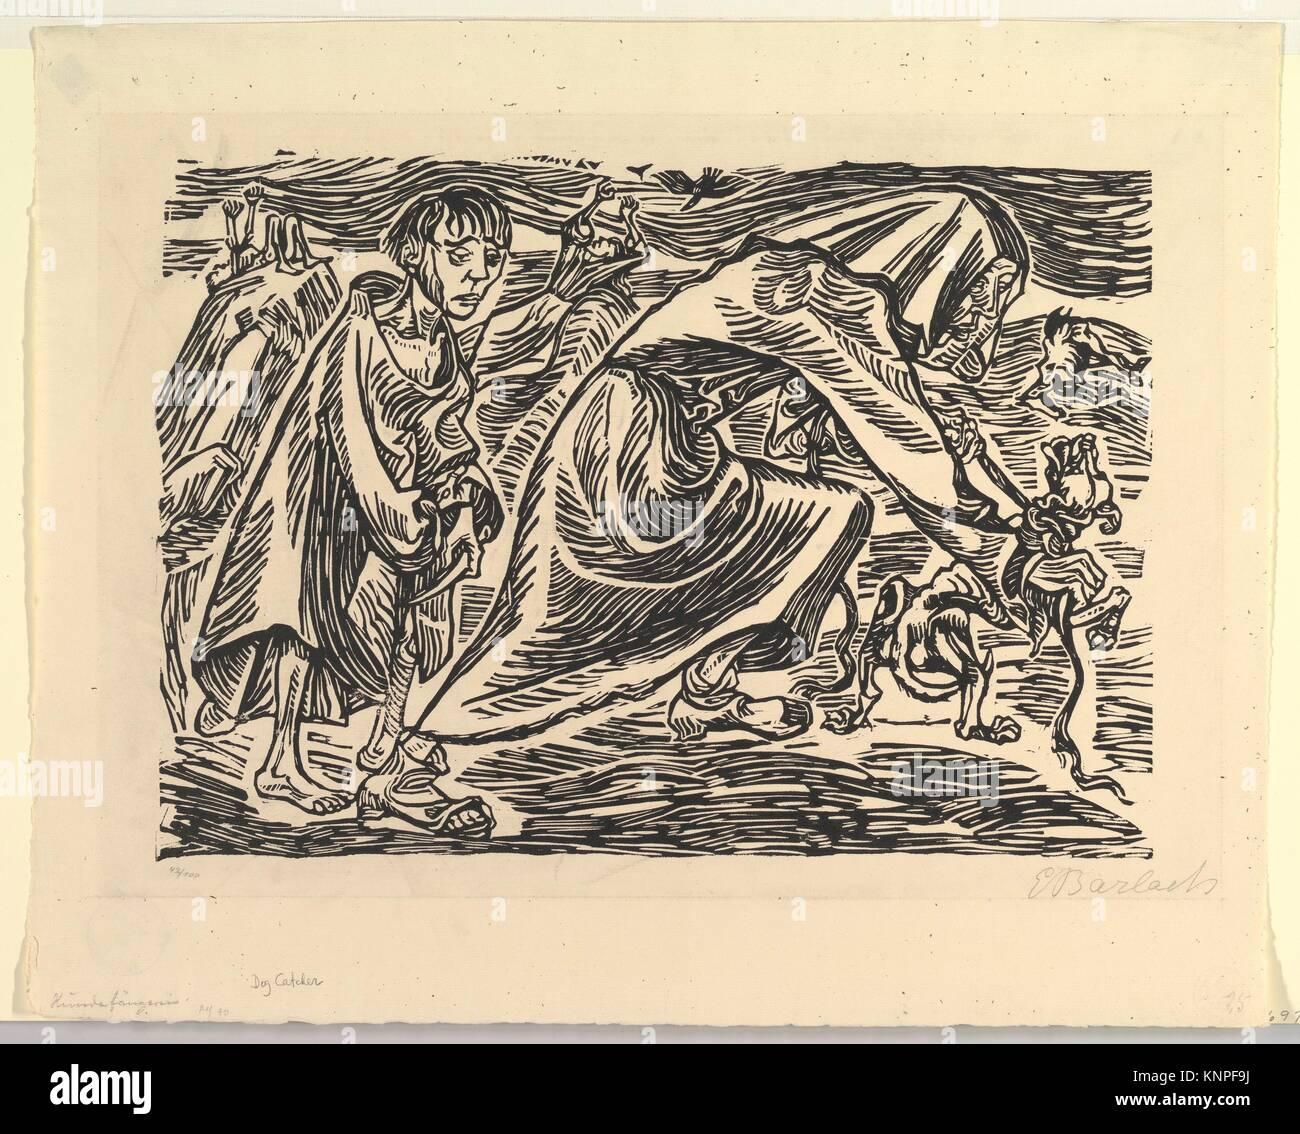 Dog Chasers (Hundefängerin). Artist: Ernst Barlach (German, Wedel 1870-1938 Rostock); Date: 1919; Medium: Woodcut; - Stock Image